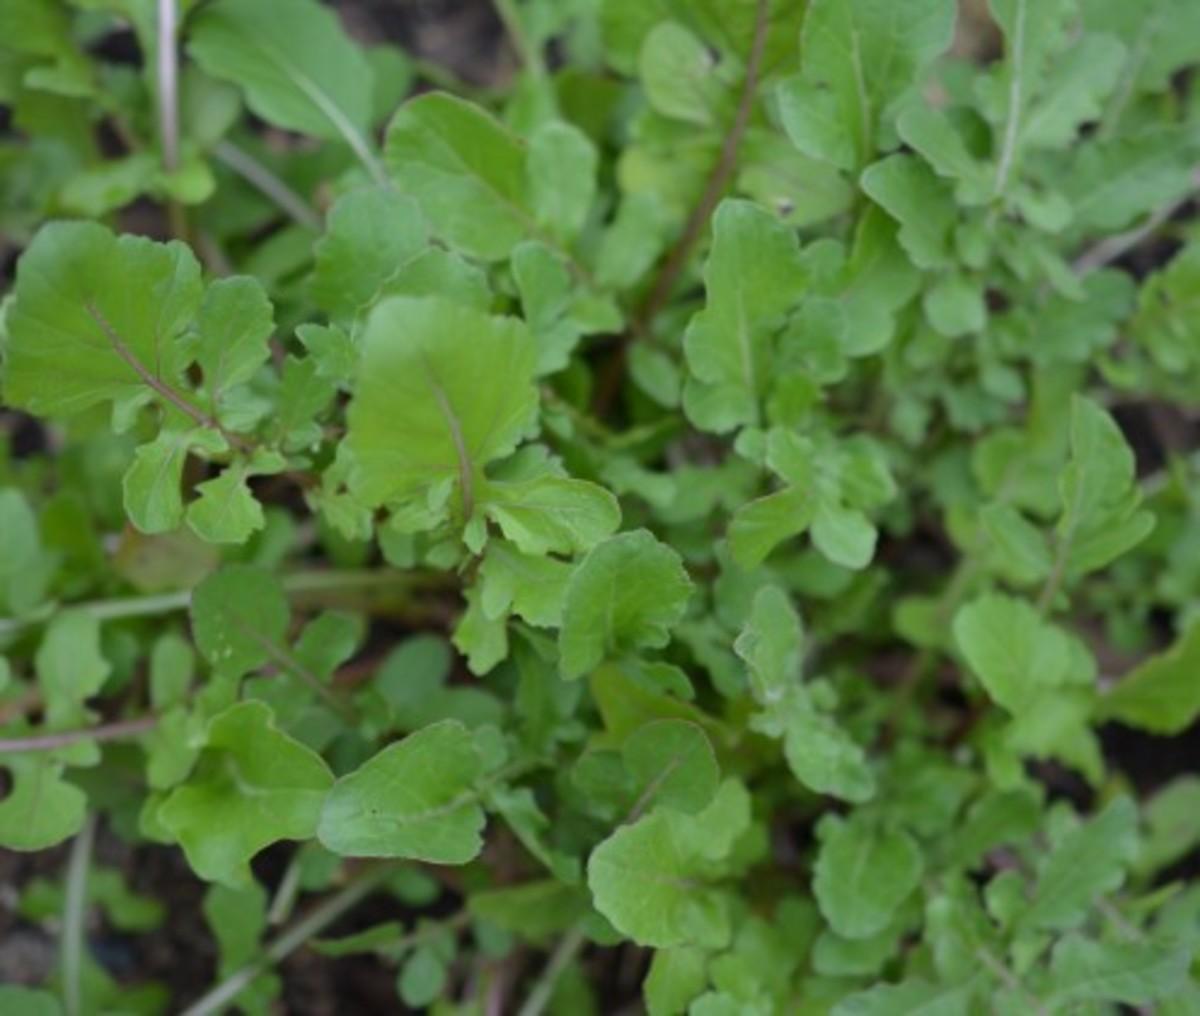 Arugula in my kitchen garden last season added a nutty, peppery taste to our salads.